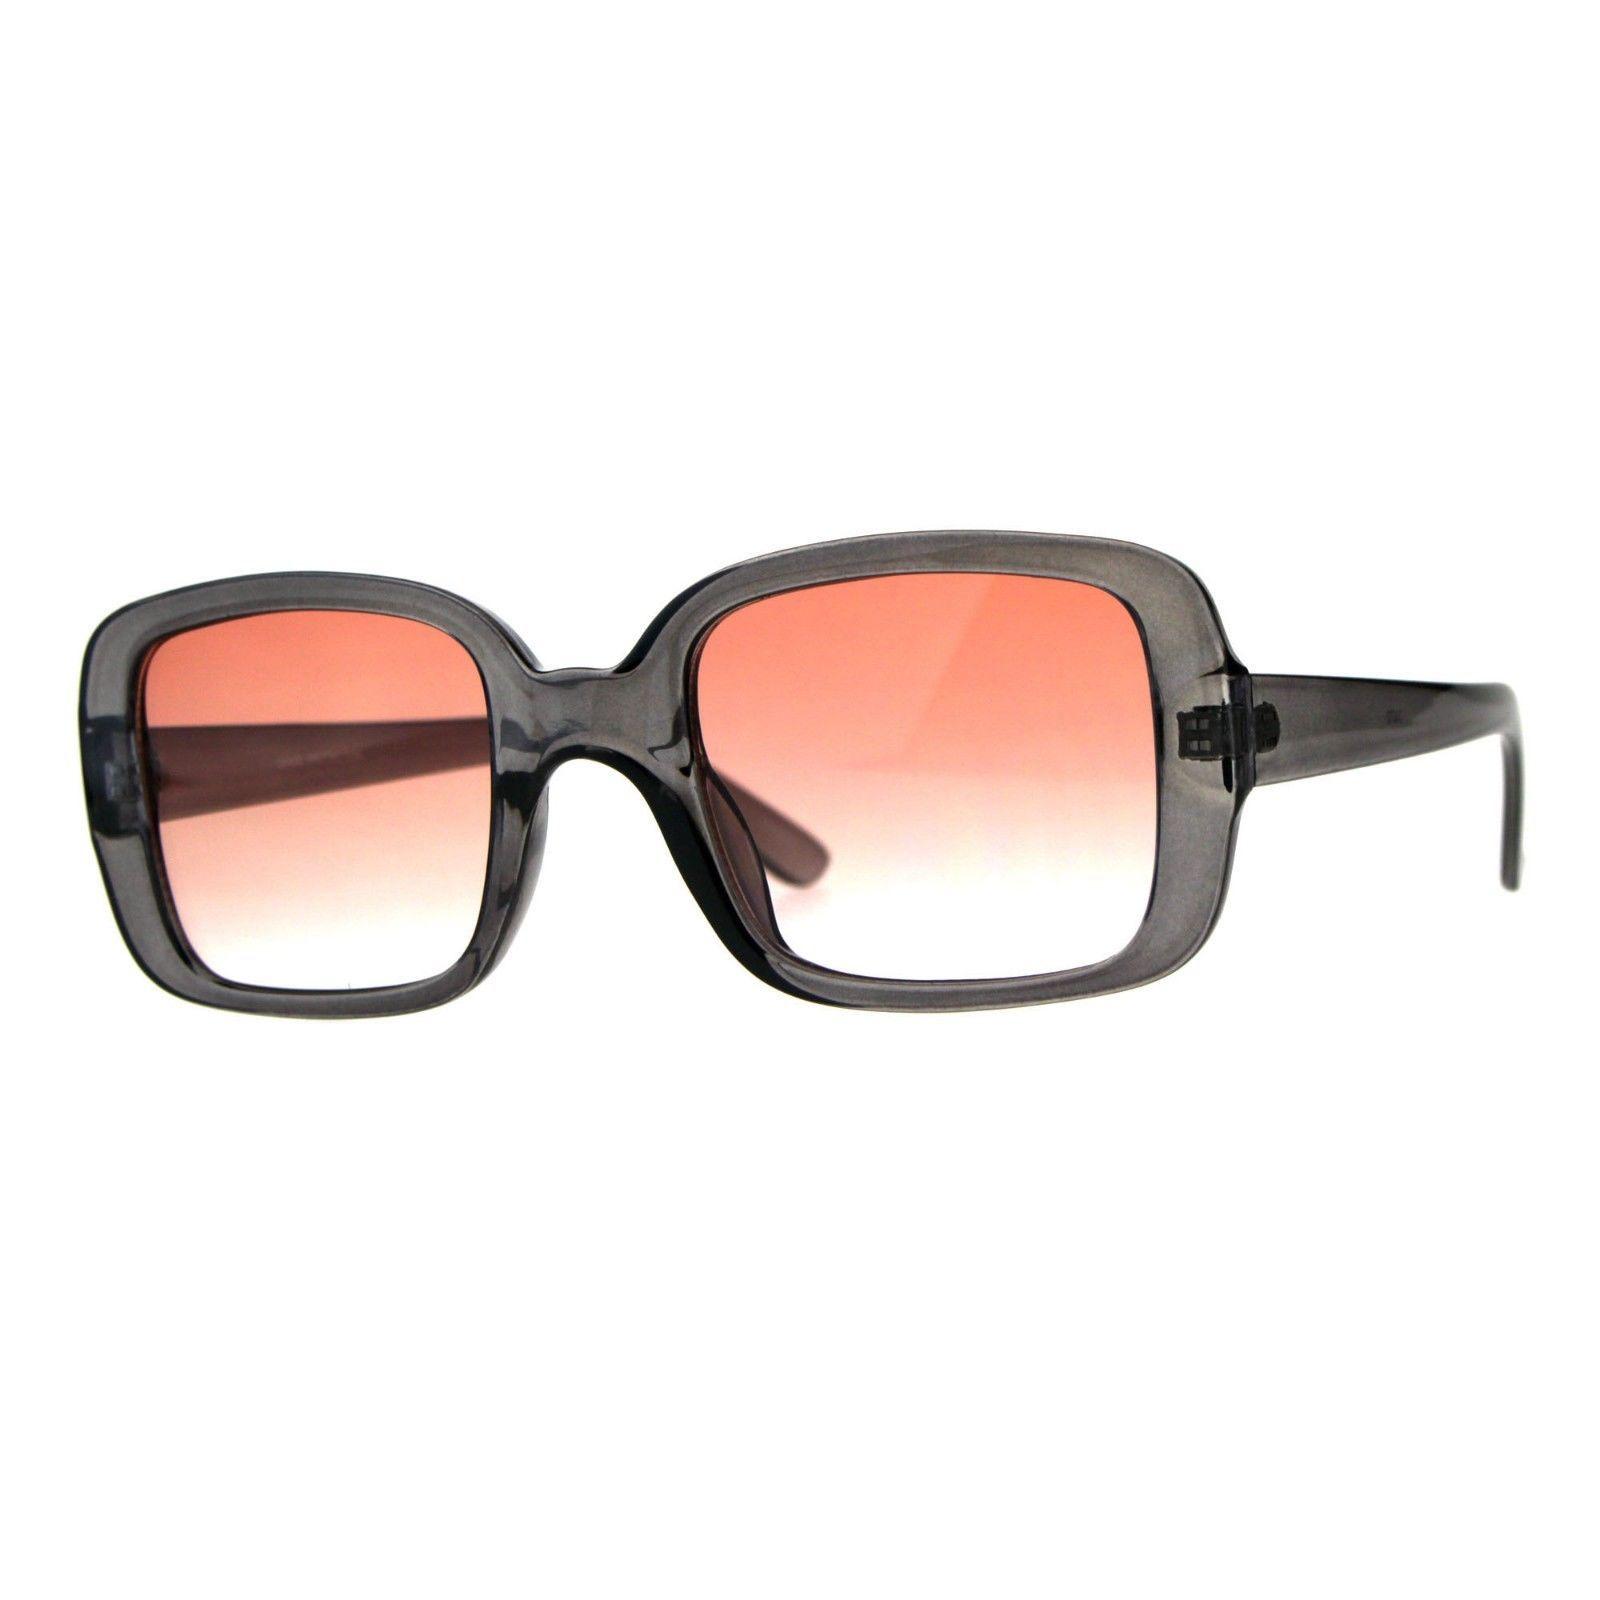 Vintage Retro Sunglasses Womens Square Rectangular Classic Fashion